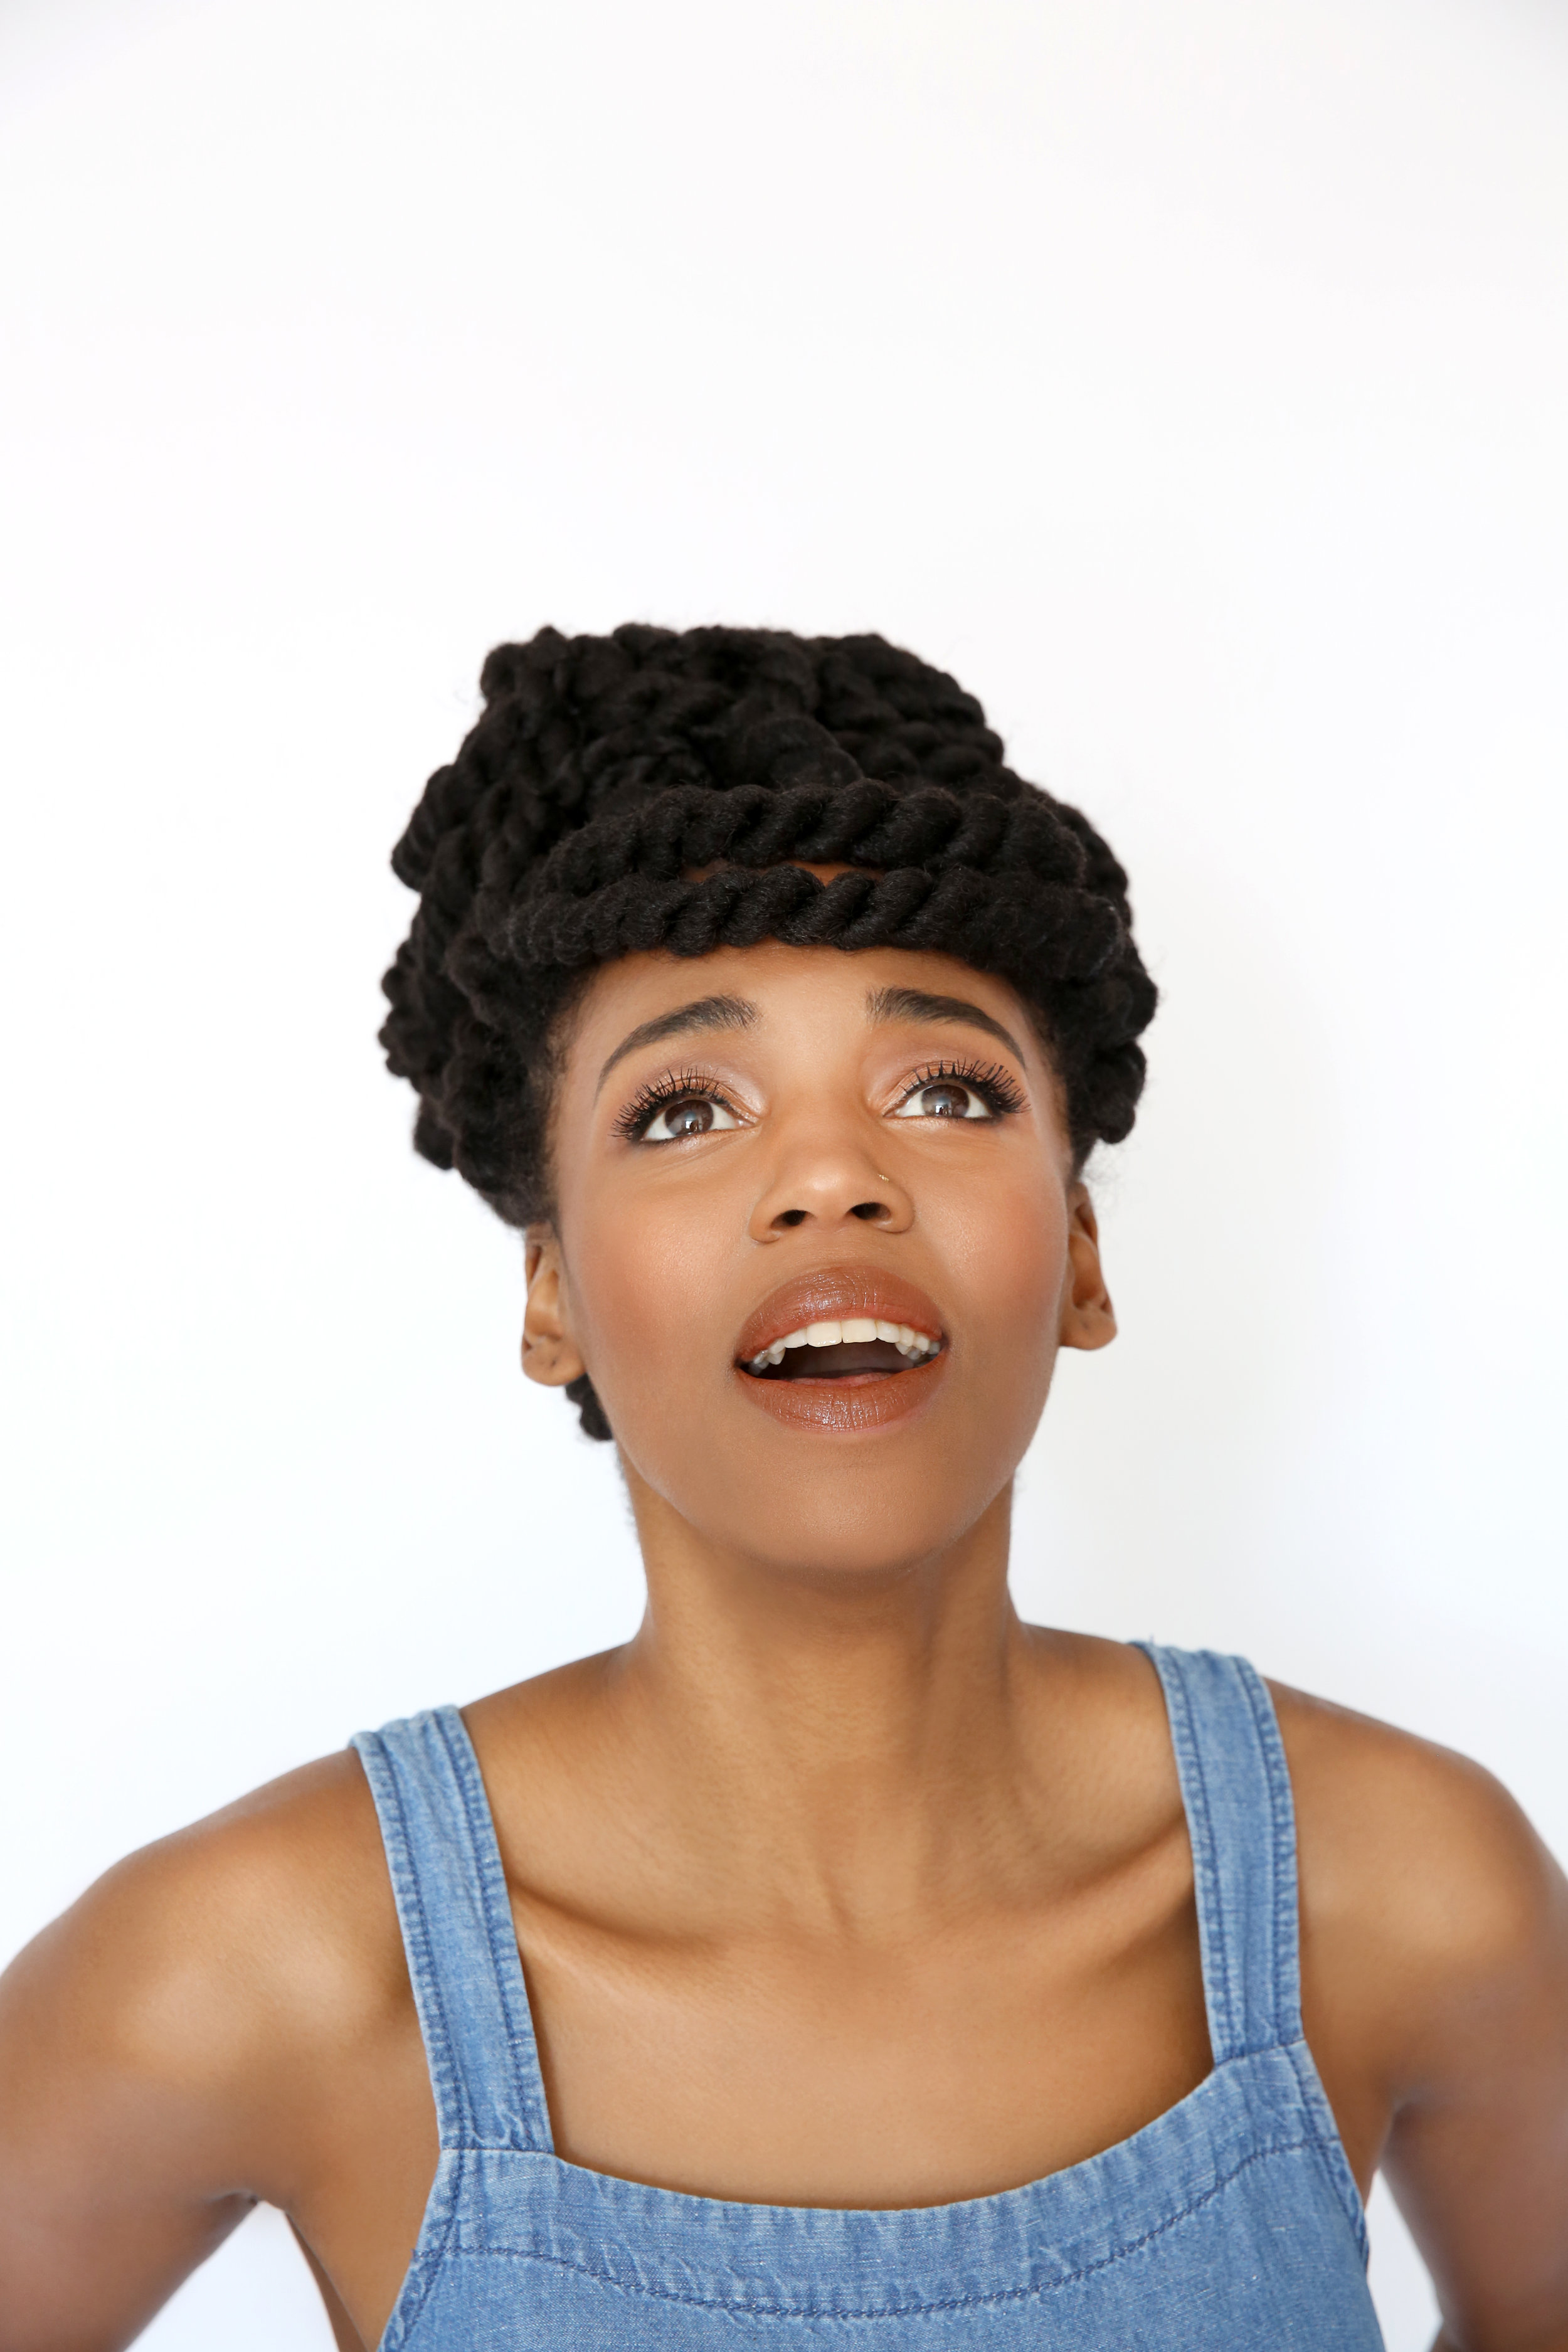 Head Full Of Hair - Look Up Headshot.jpg